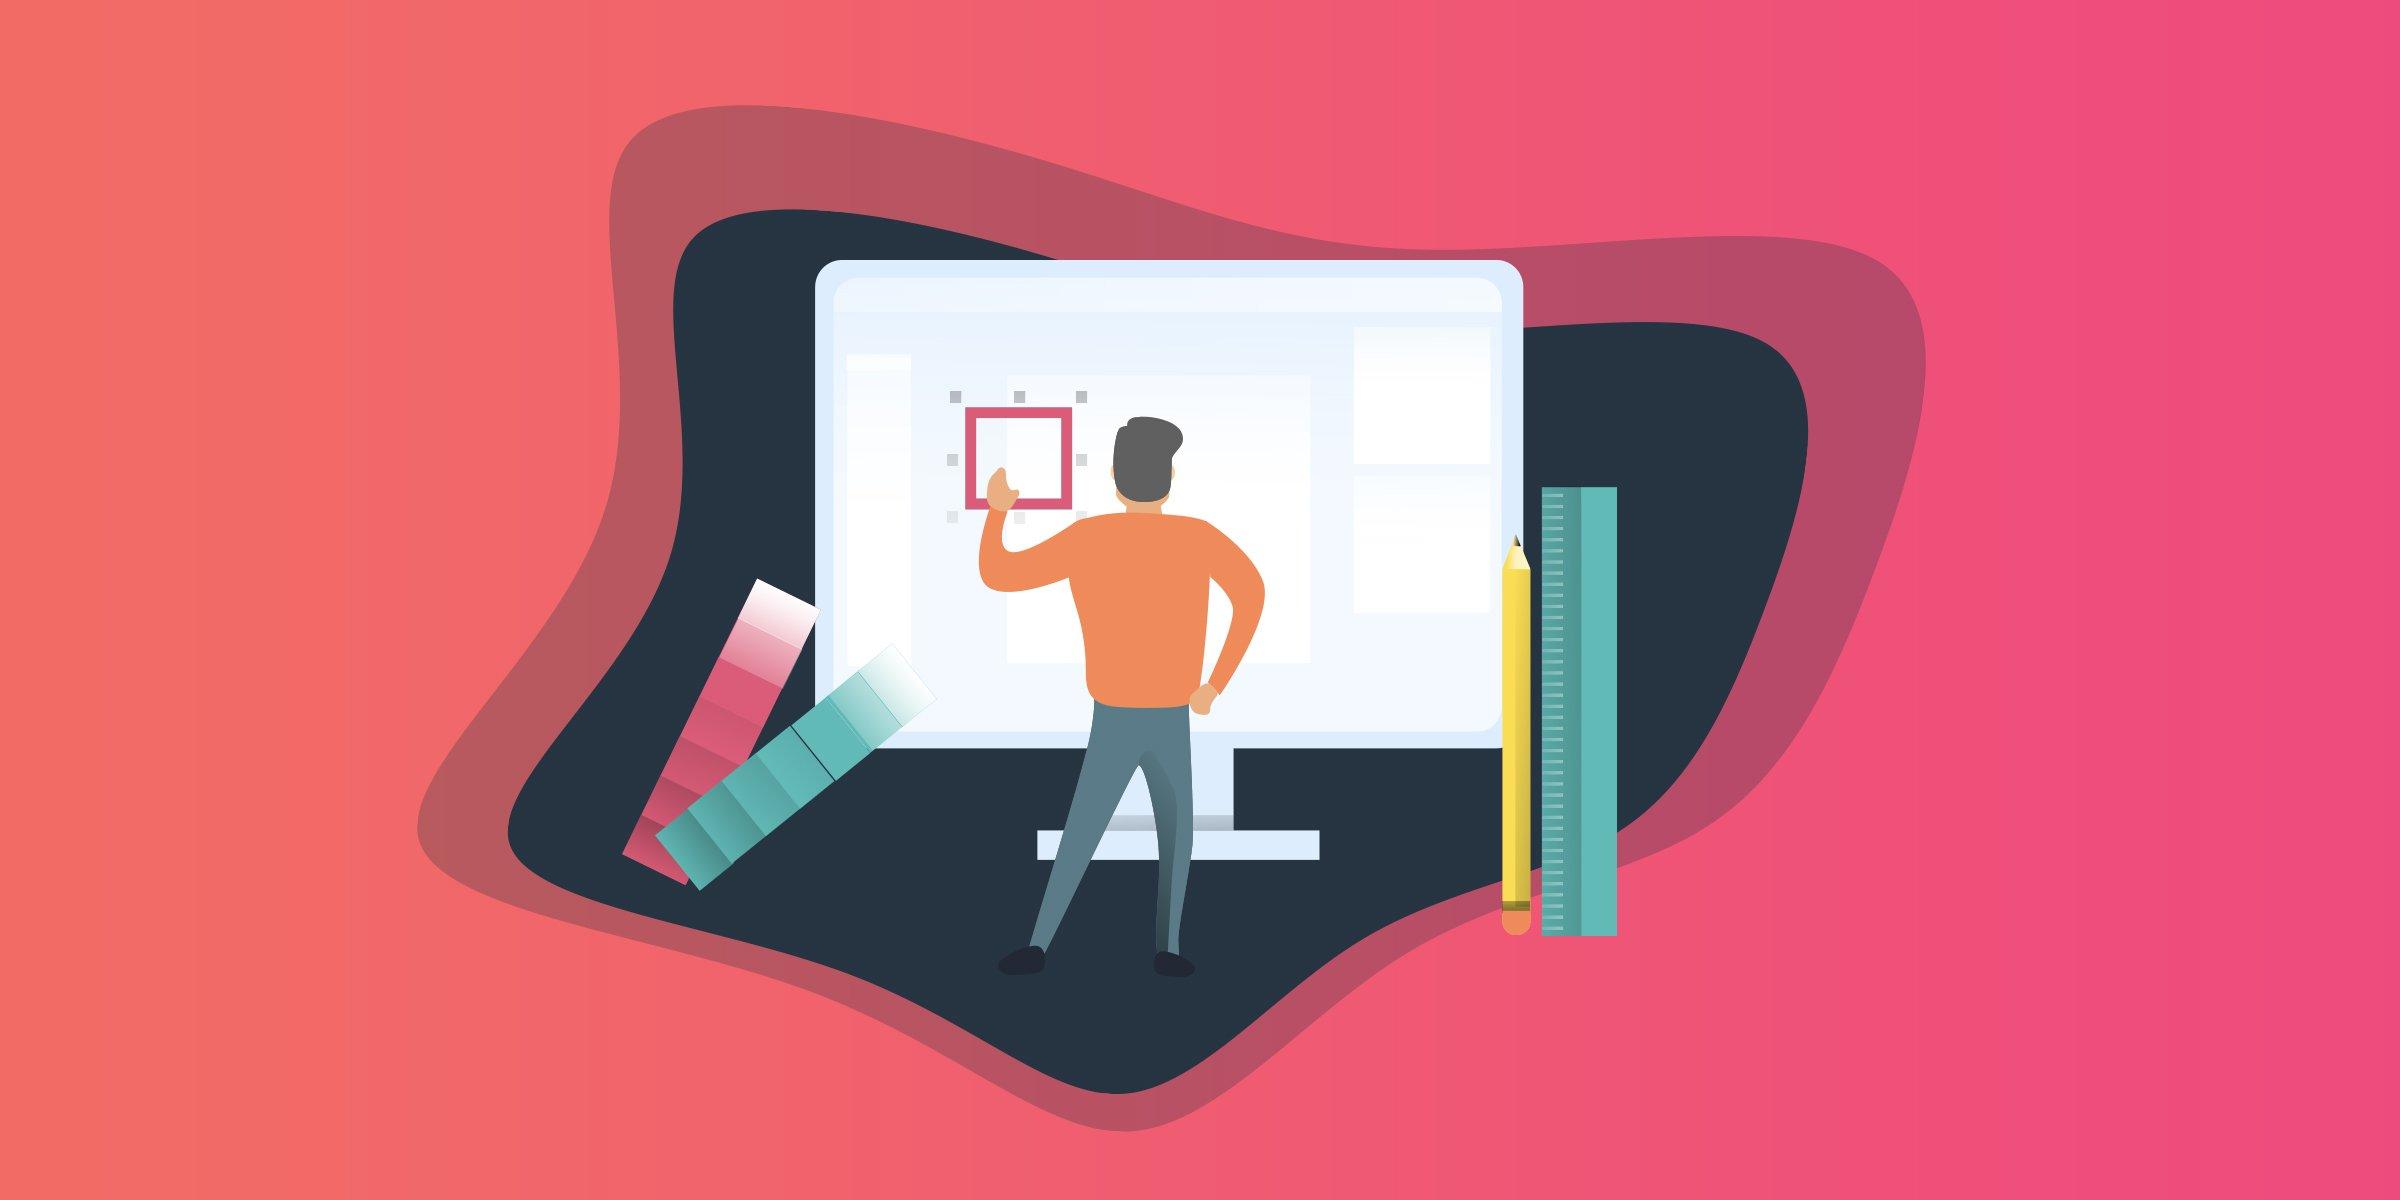 Design Basics 101: Key Elements to Becoming a Killer Web Designer